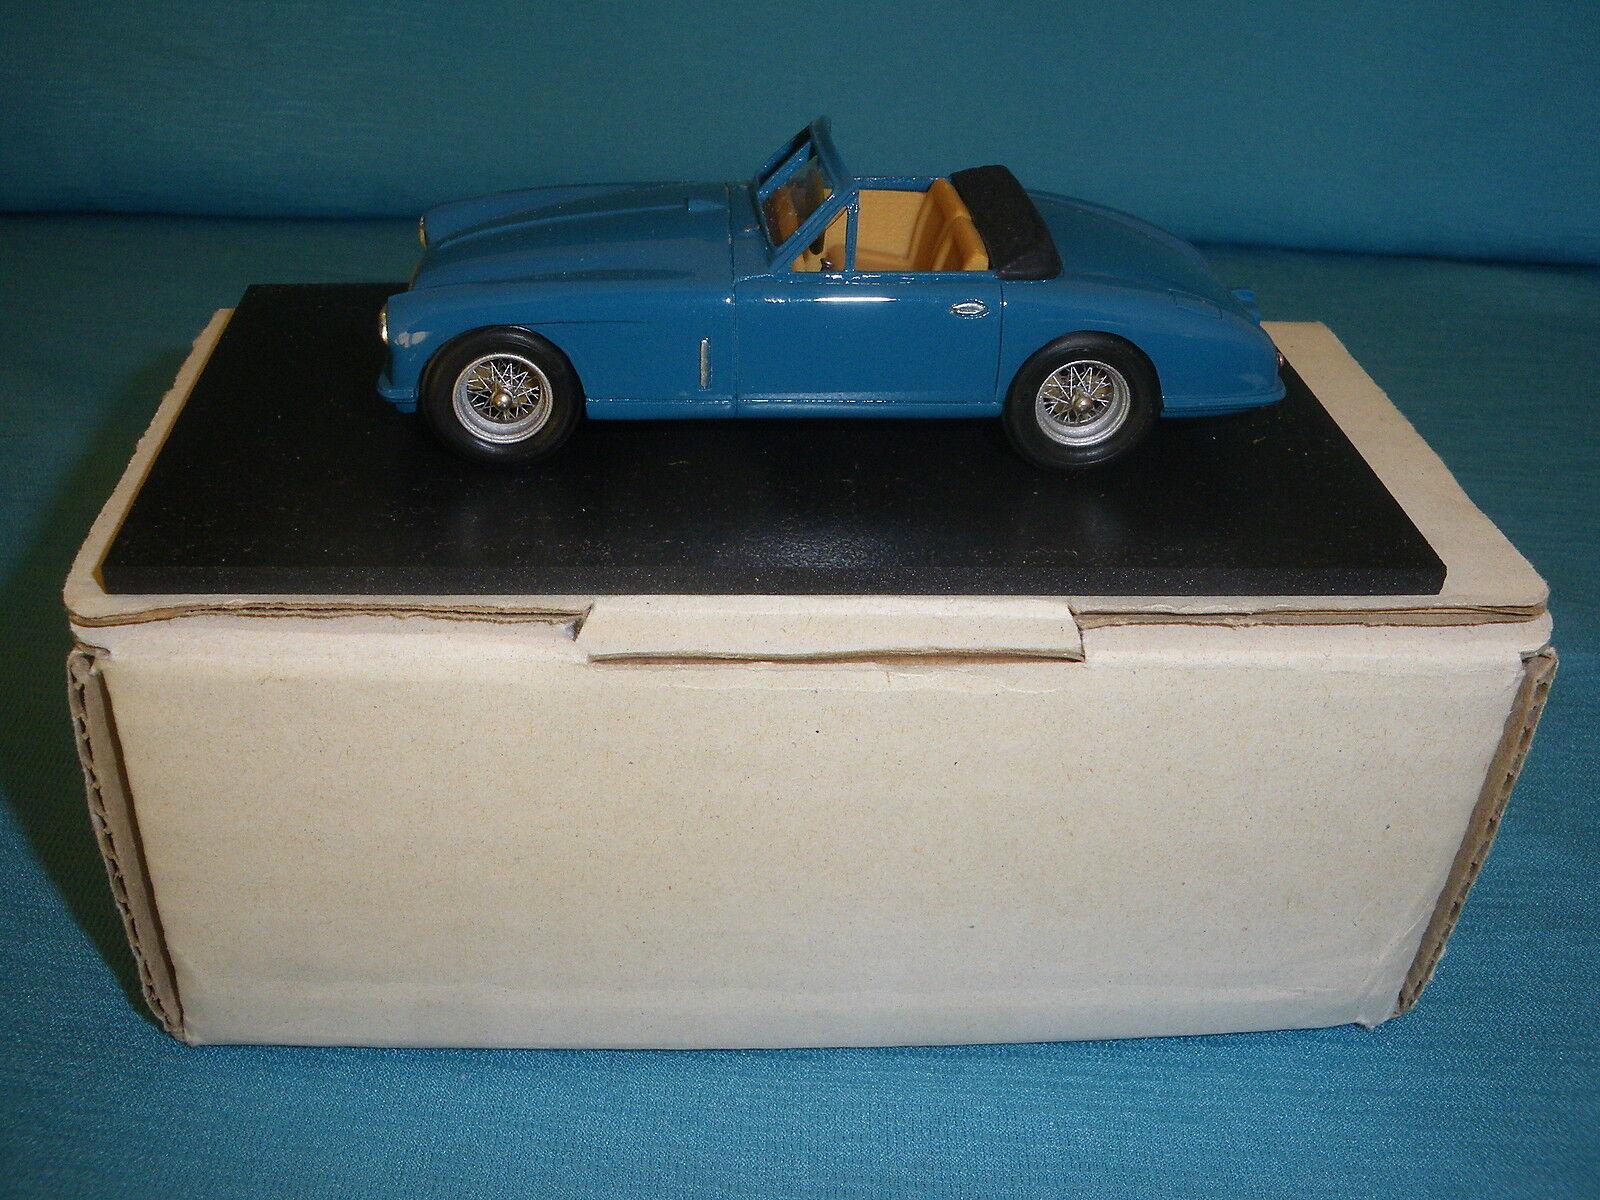 HECO MODELLI 67M Kit 1/43 ASTON MARTIN DB2 DROPHEAD 1952 CAB. 331 I